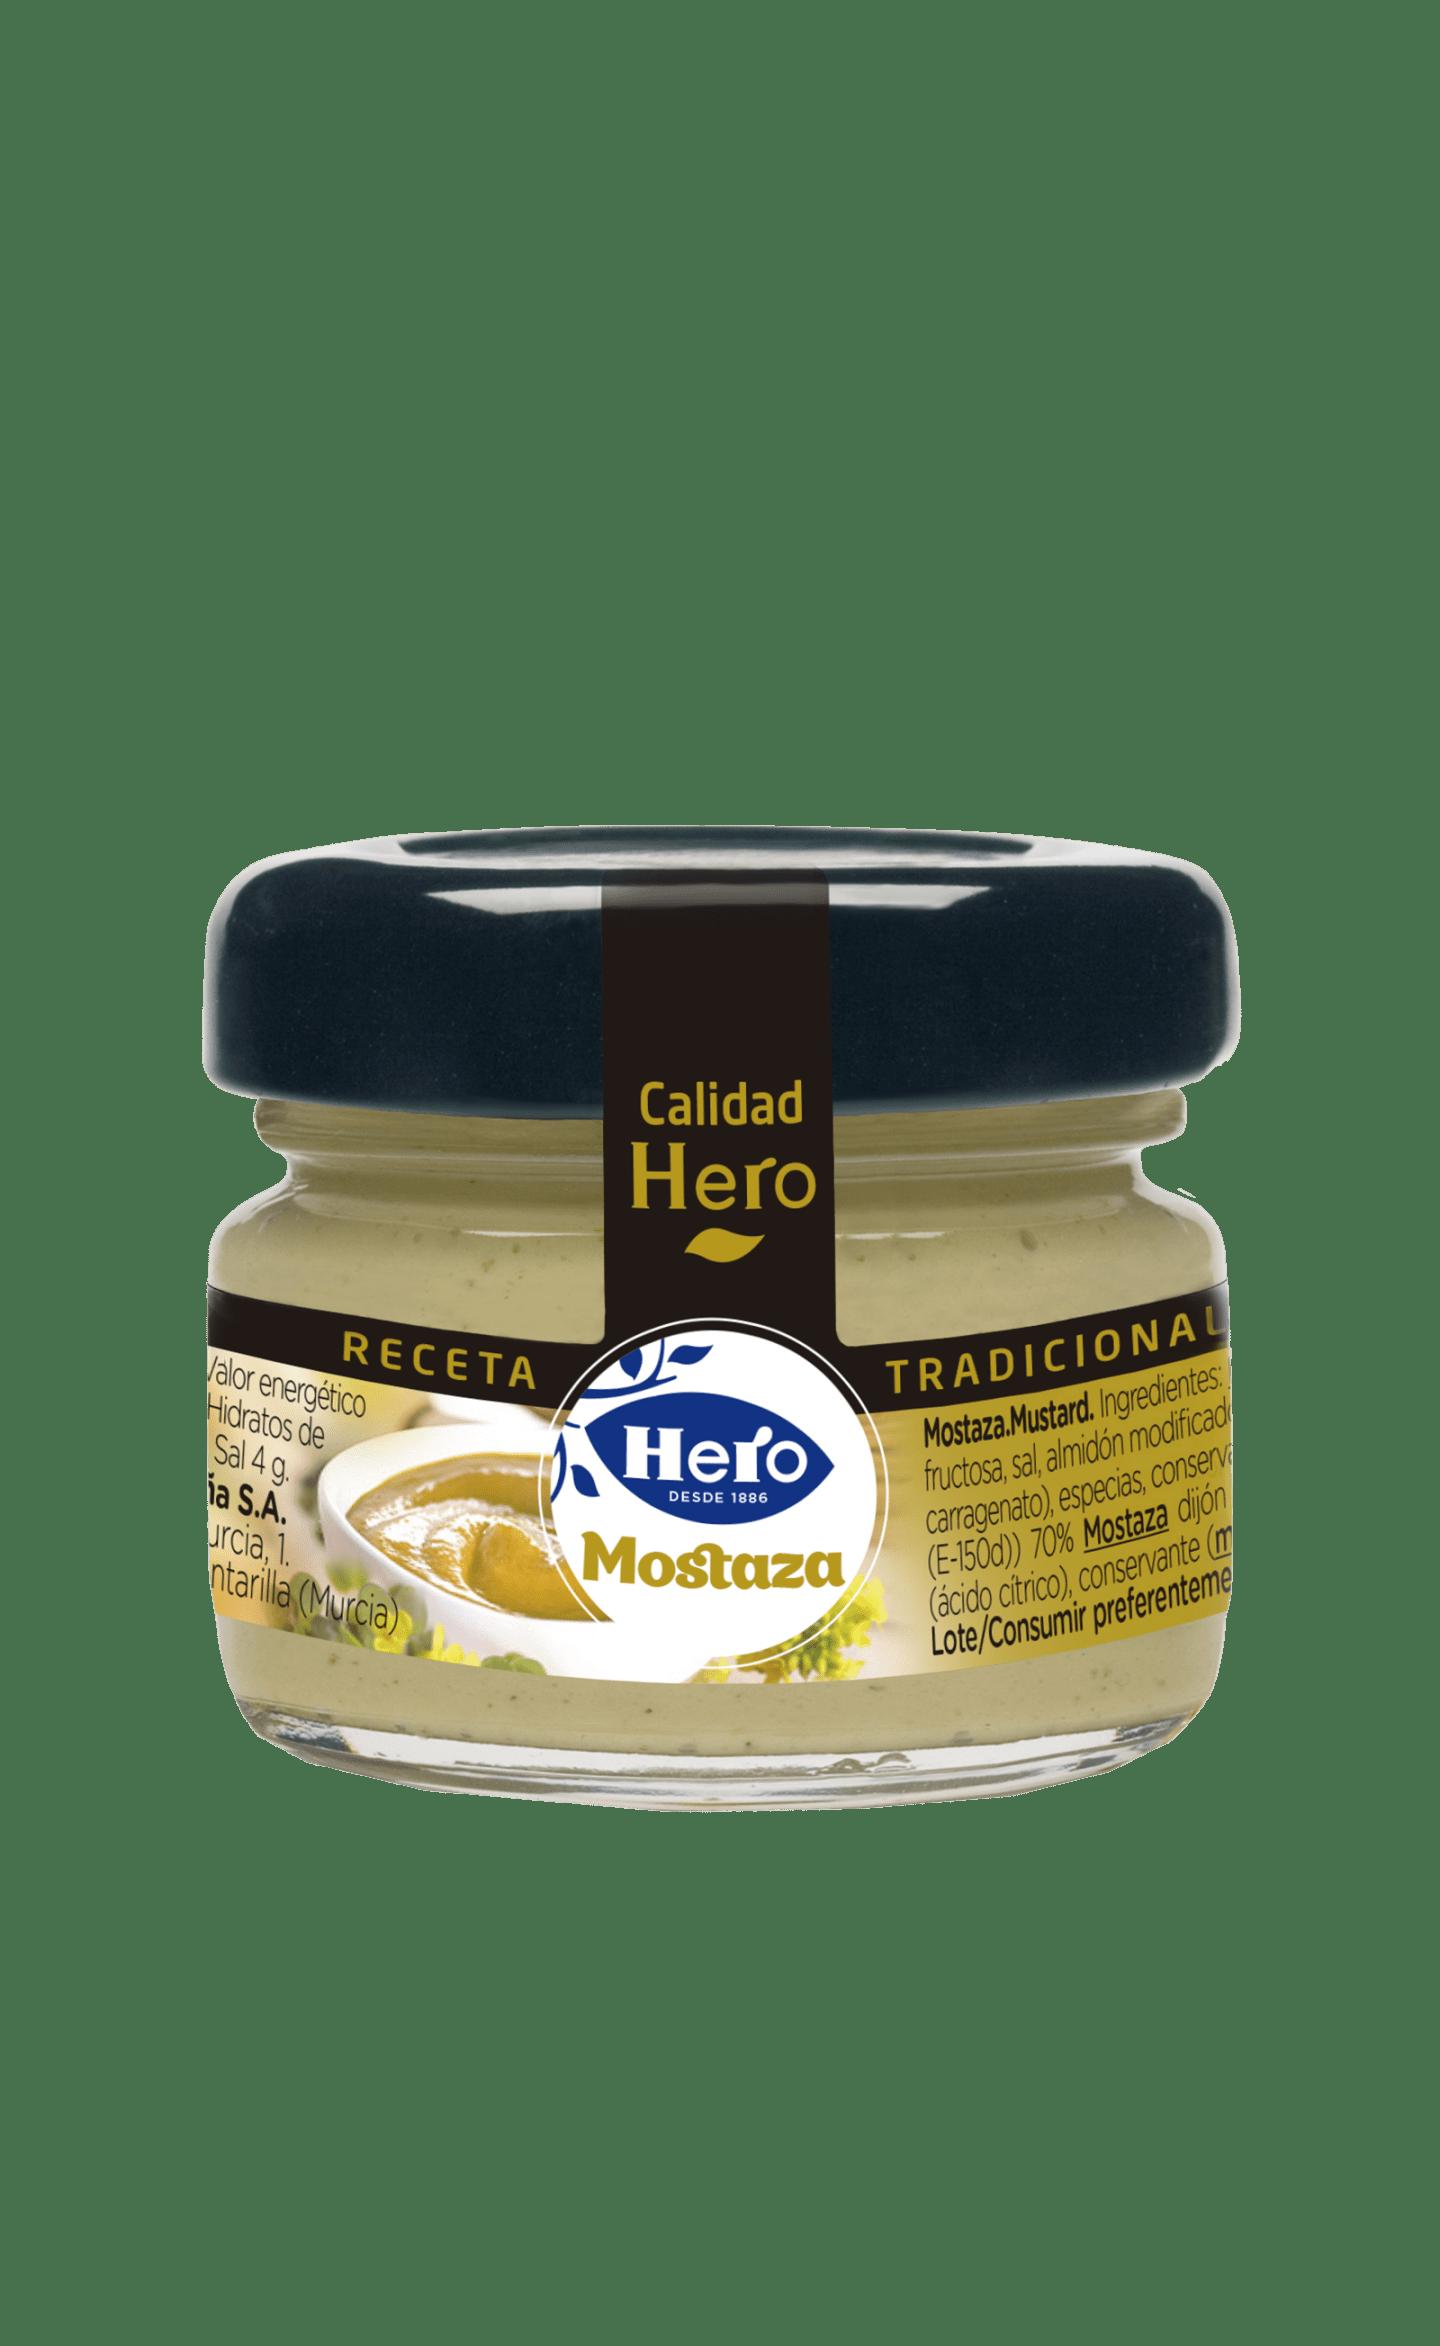 Tarrito de Mostaza Hero